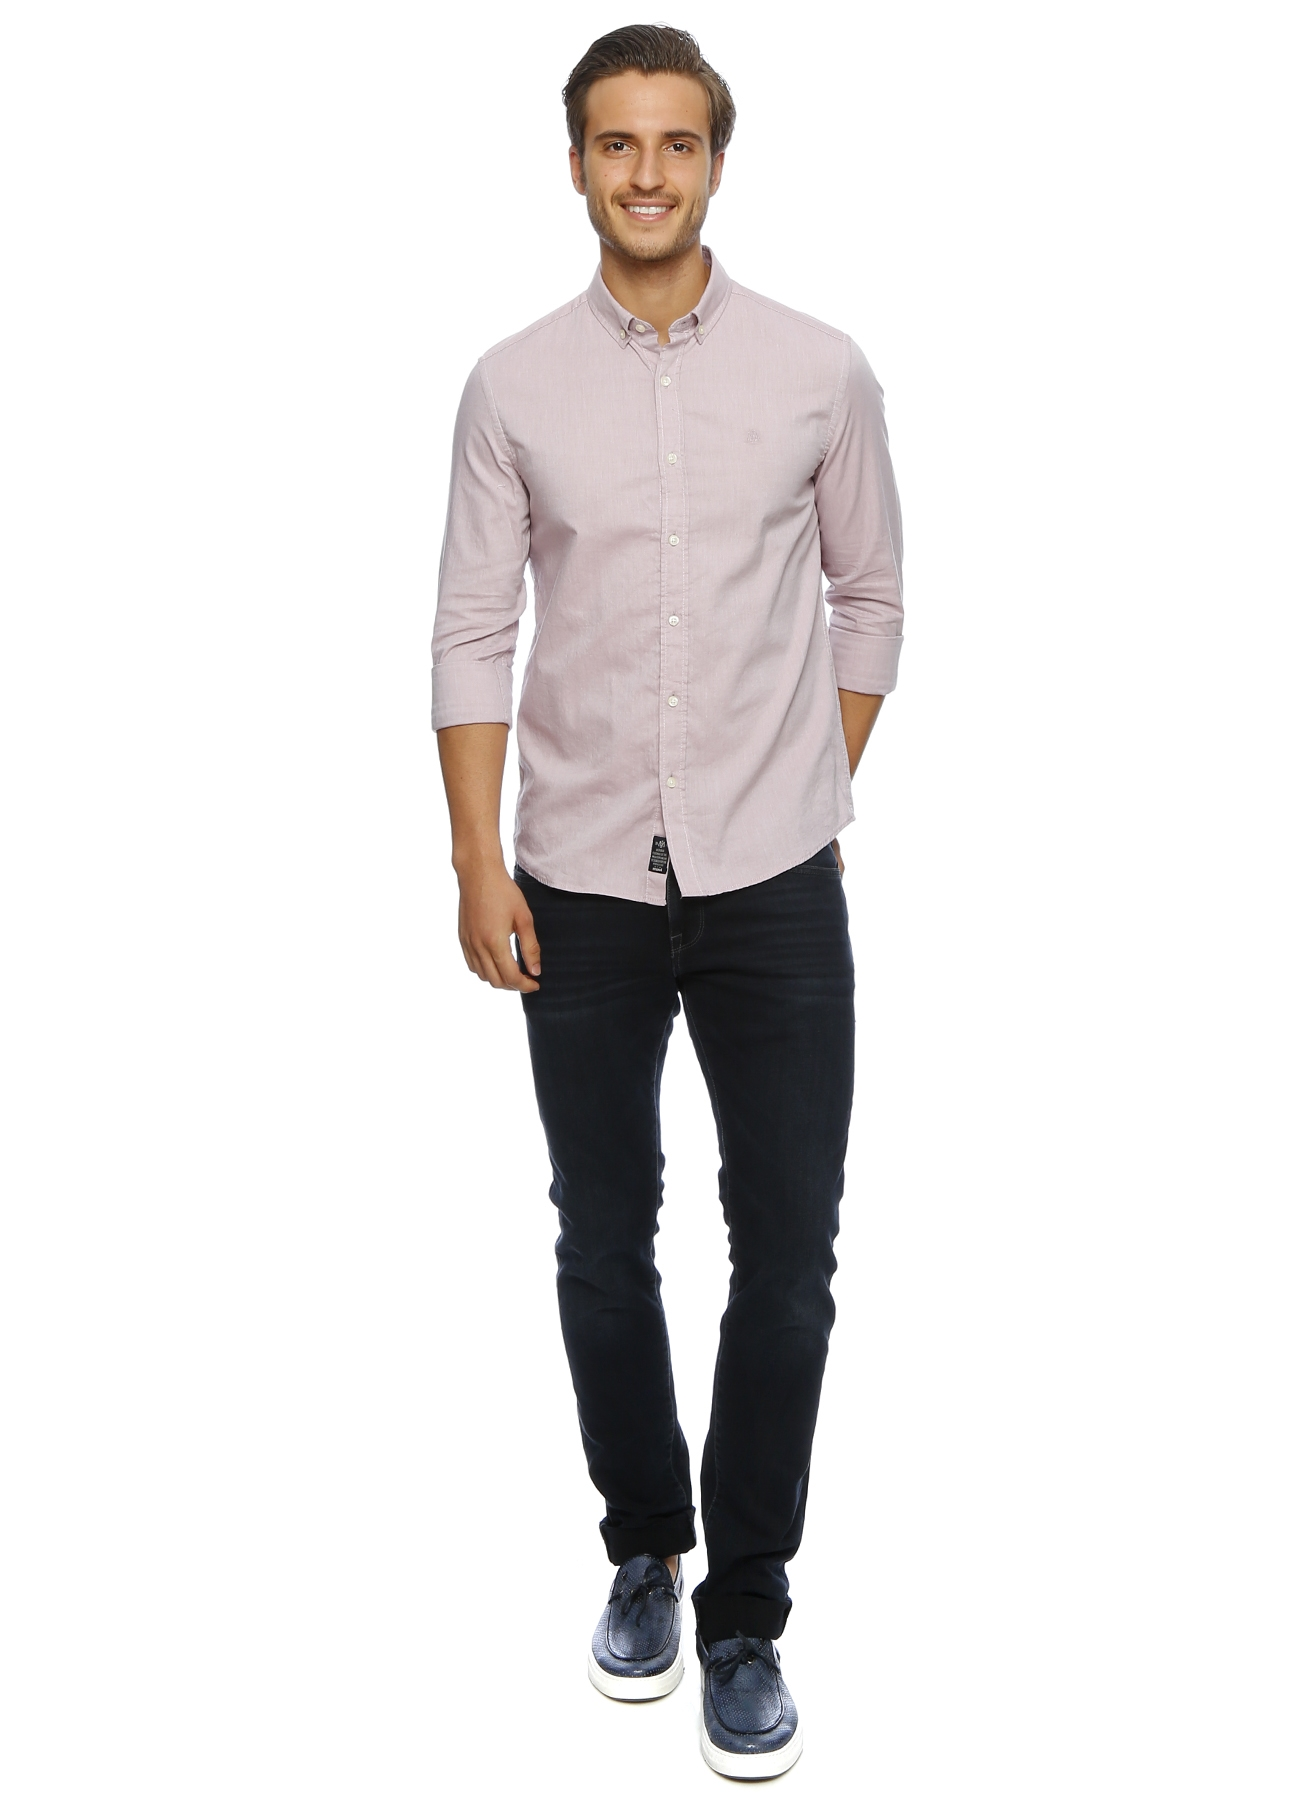 Mavi Jake Comfort Mavi Klasik Pantolon 33-34 5000133845021 Ürün Resmi